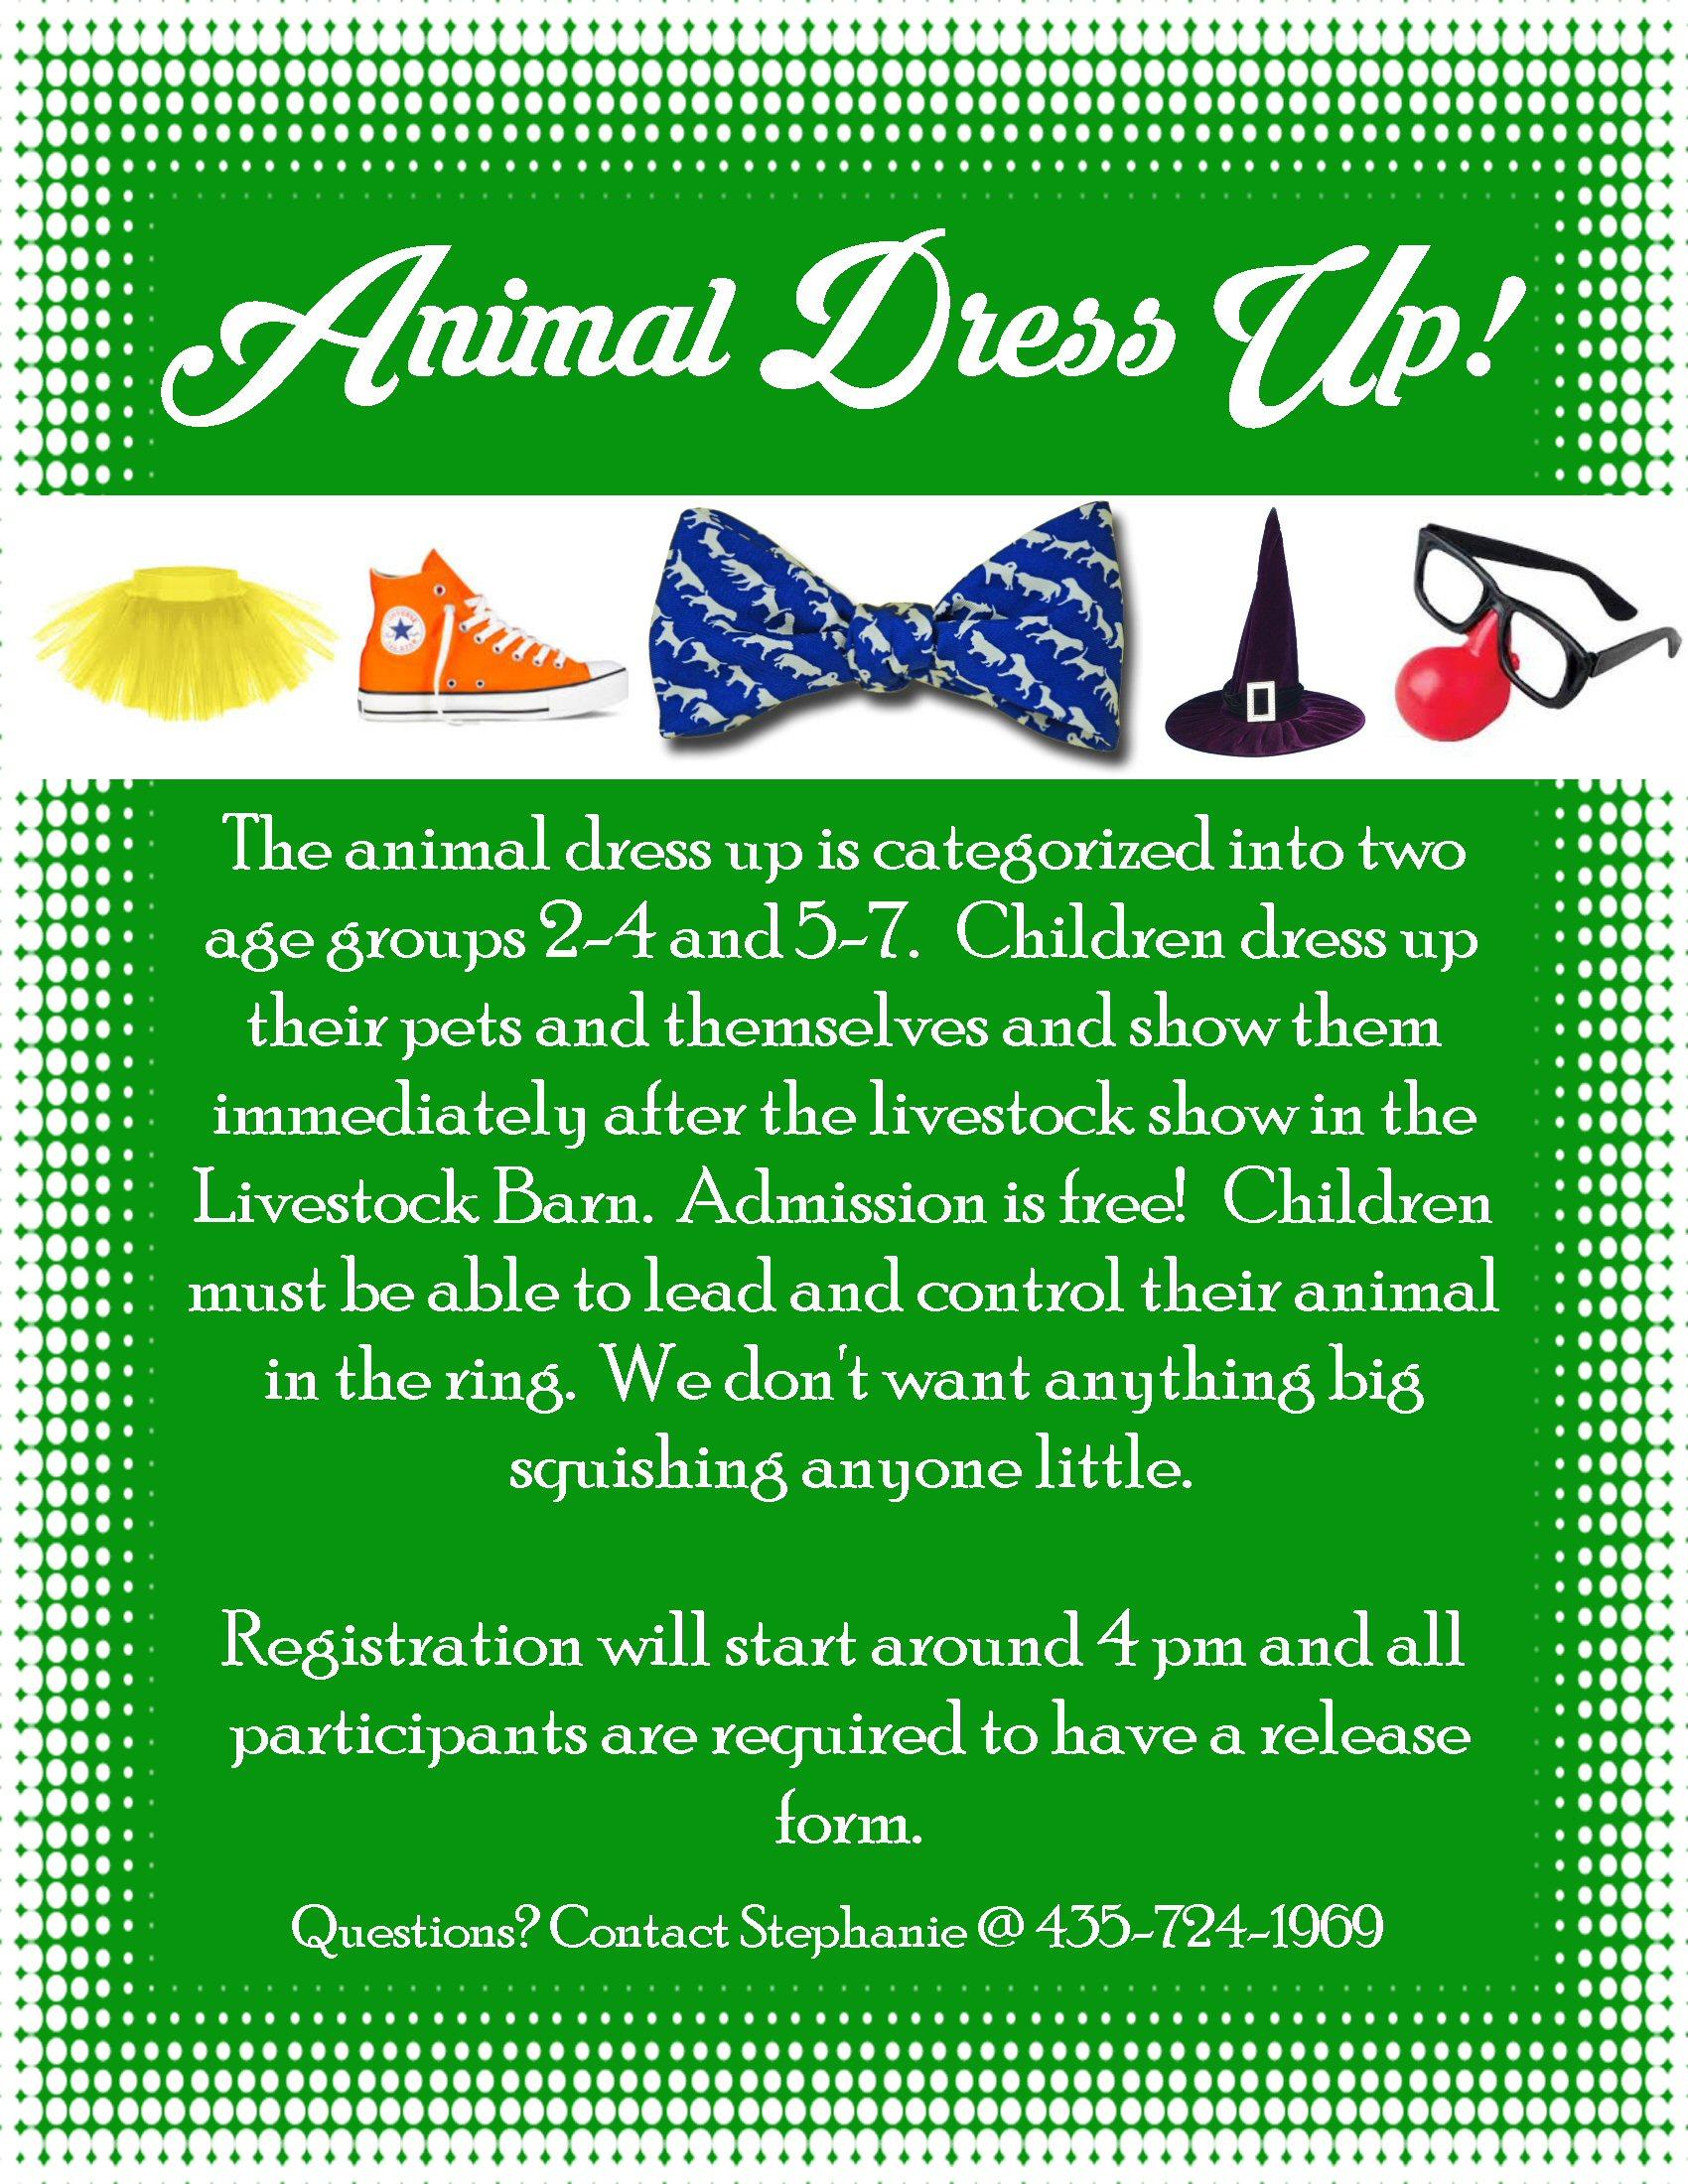 Animal Dress Up